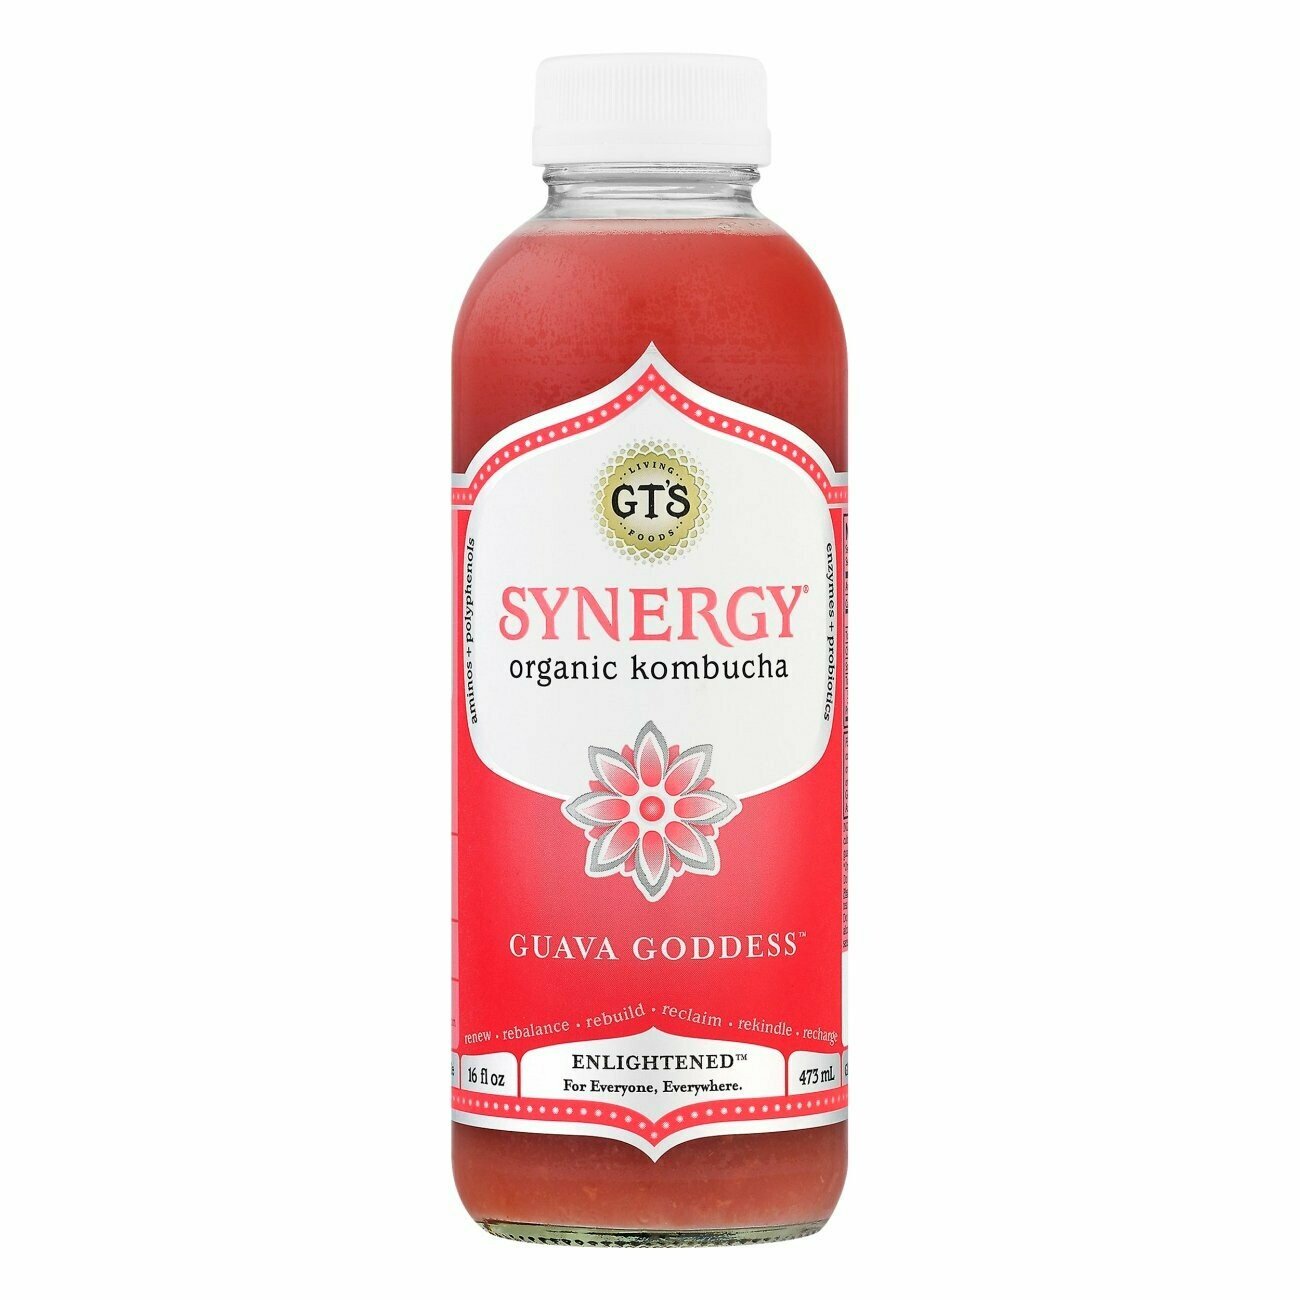 GT's Synergy Kombucha 16oz Guava Goddess